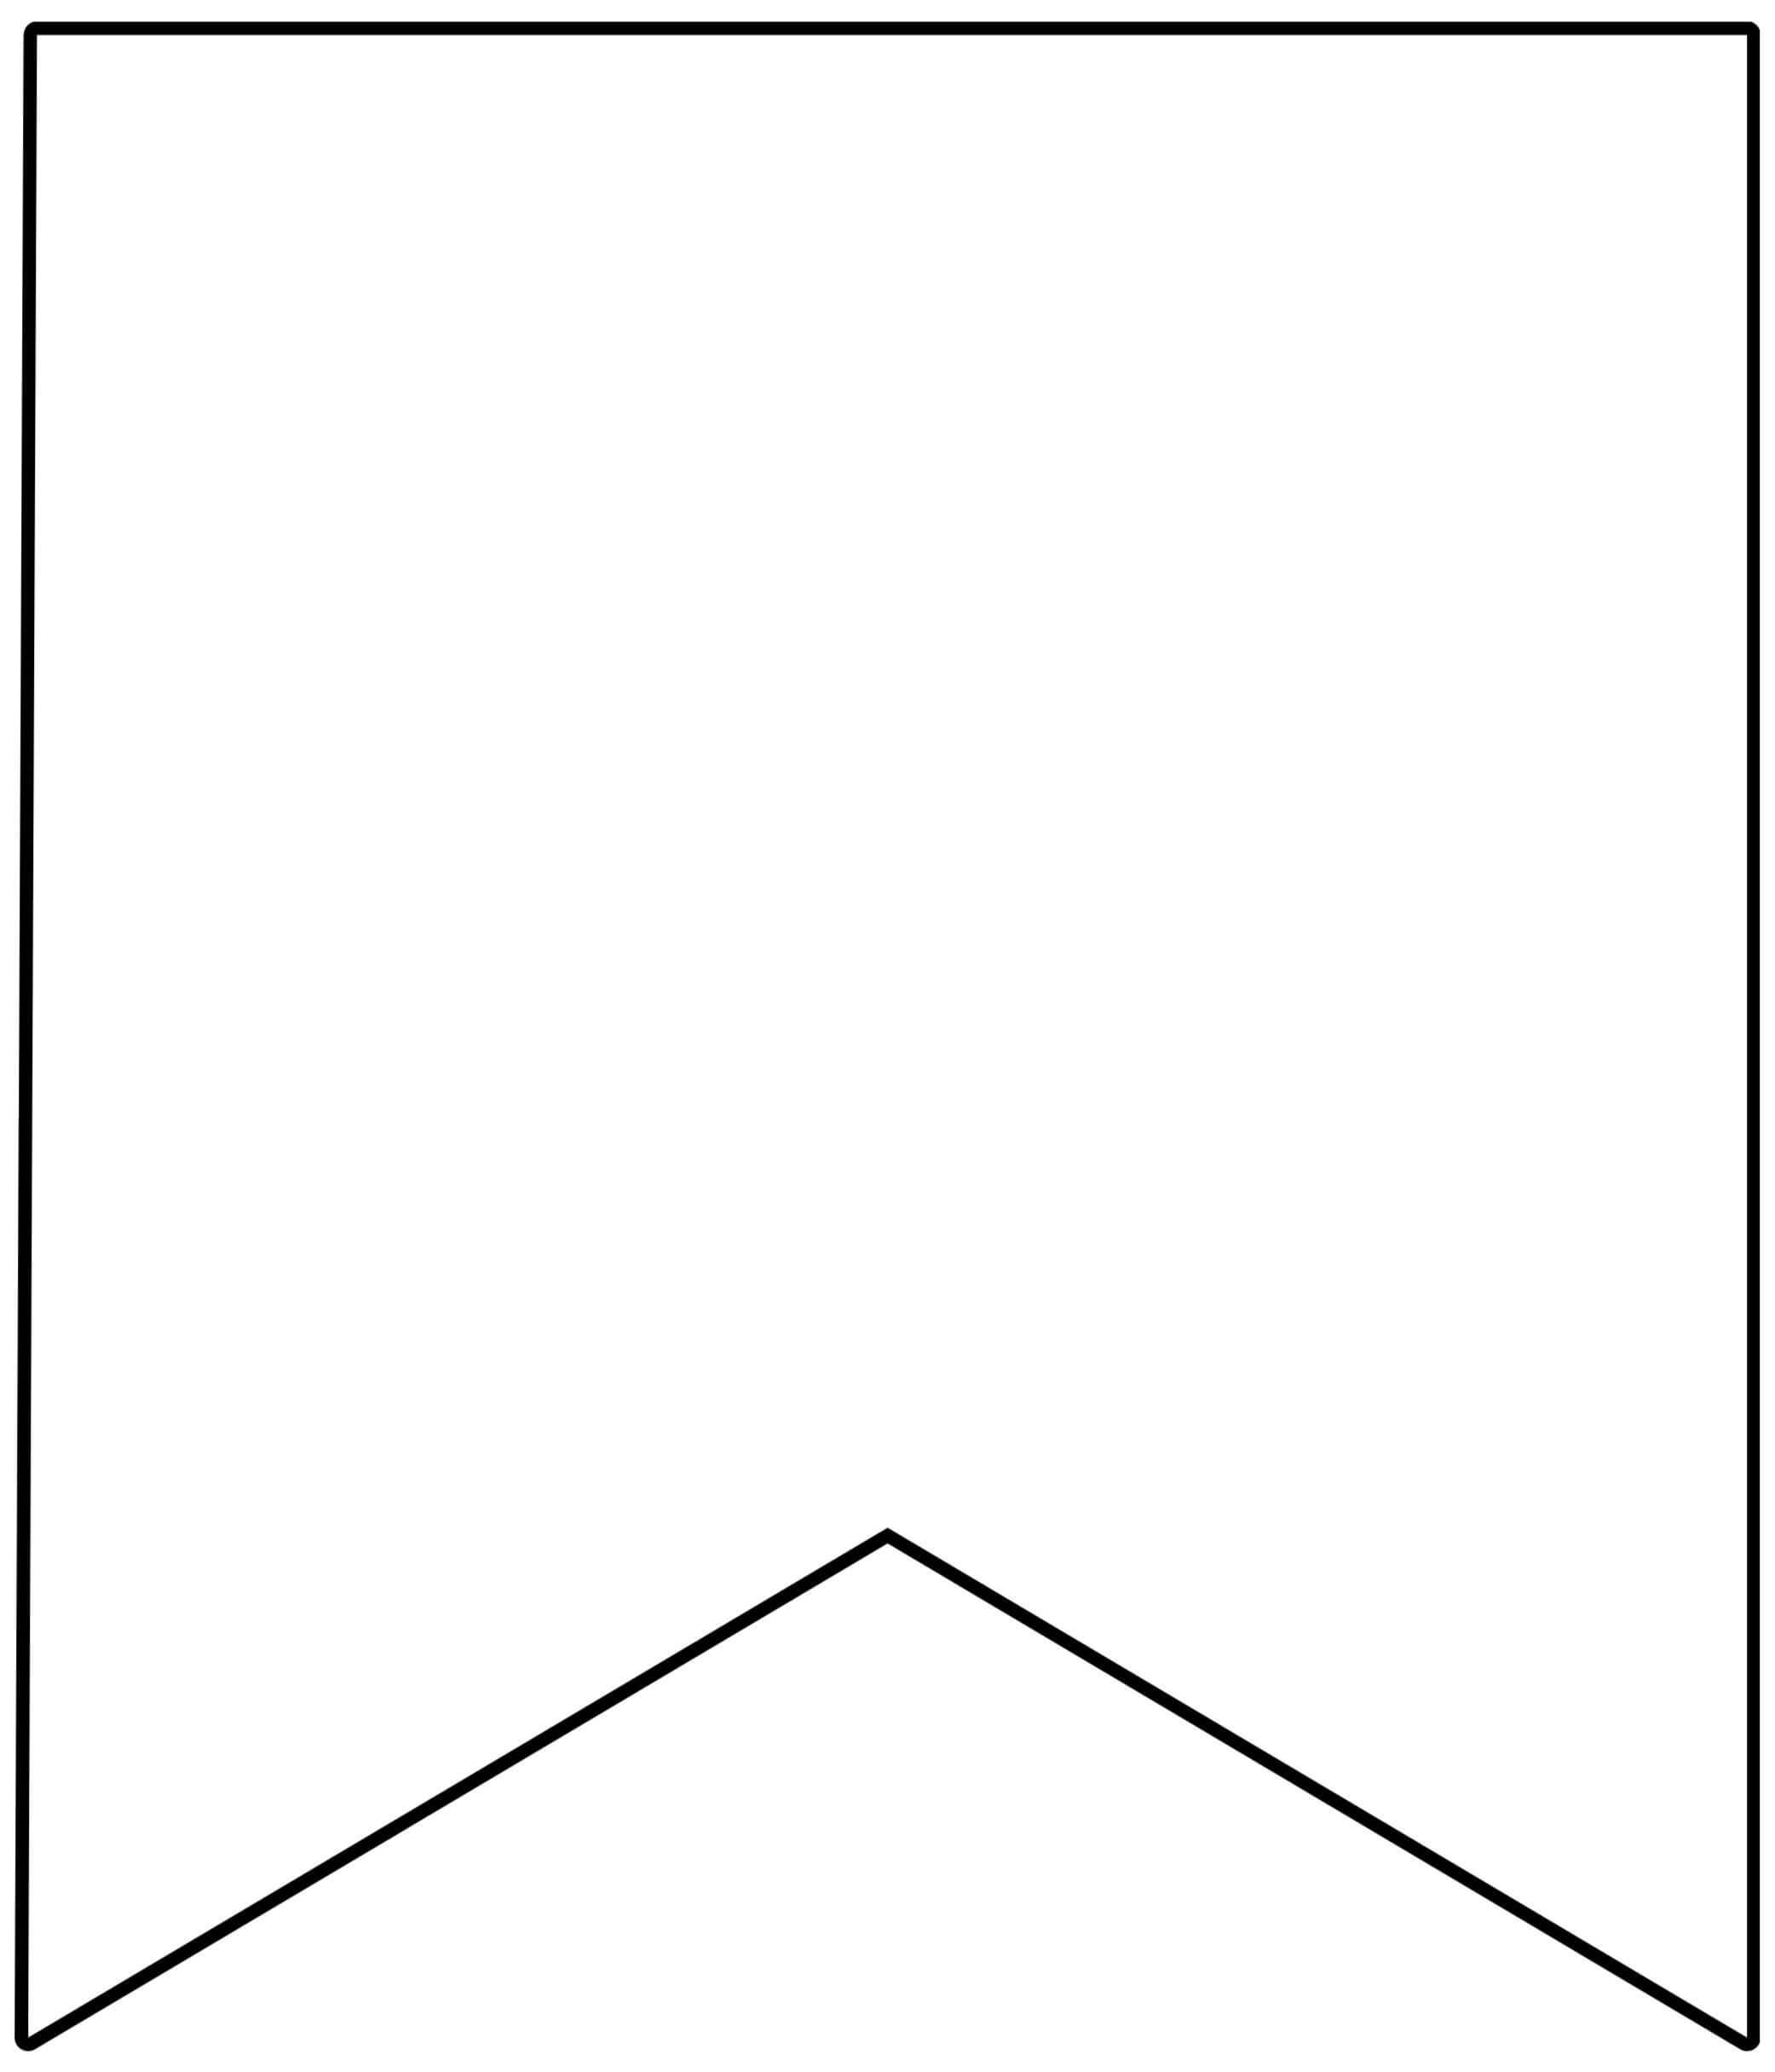 Template Printable Pennant Banner - Epp Acp | Free In Printable Pennant Banner Template Free